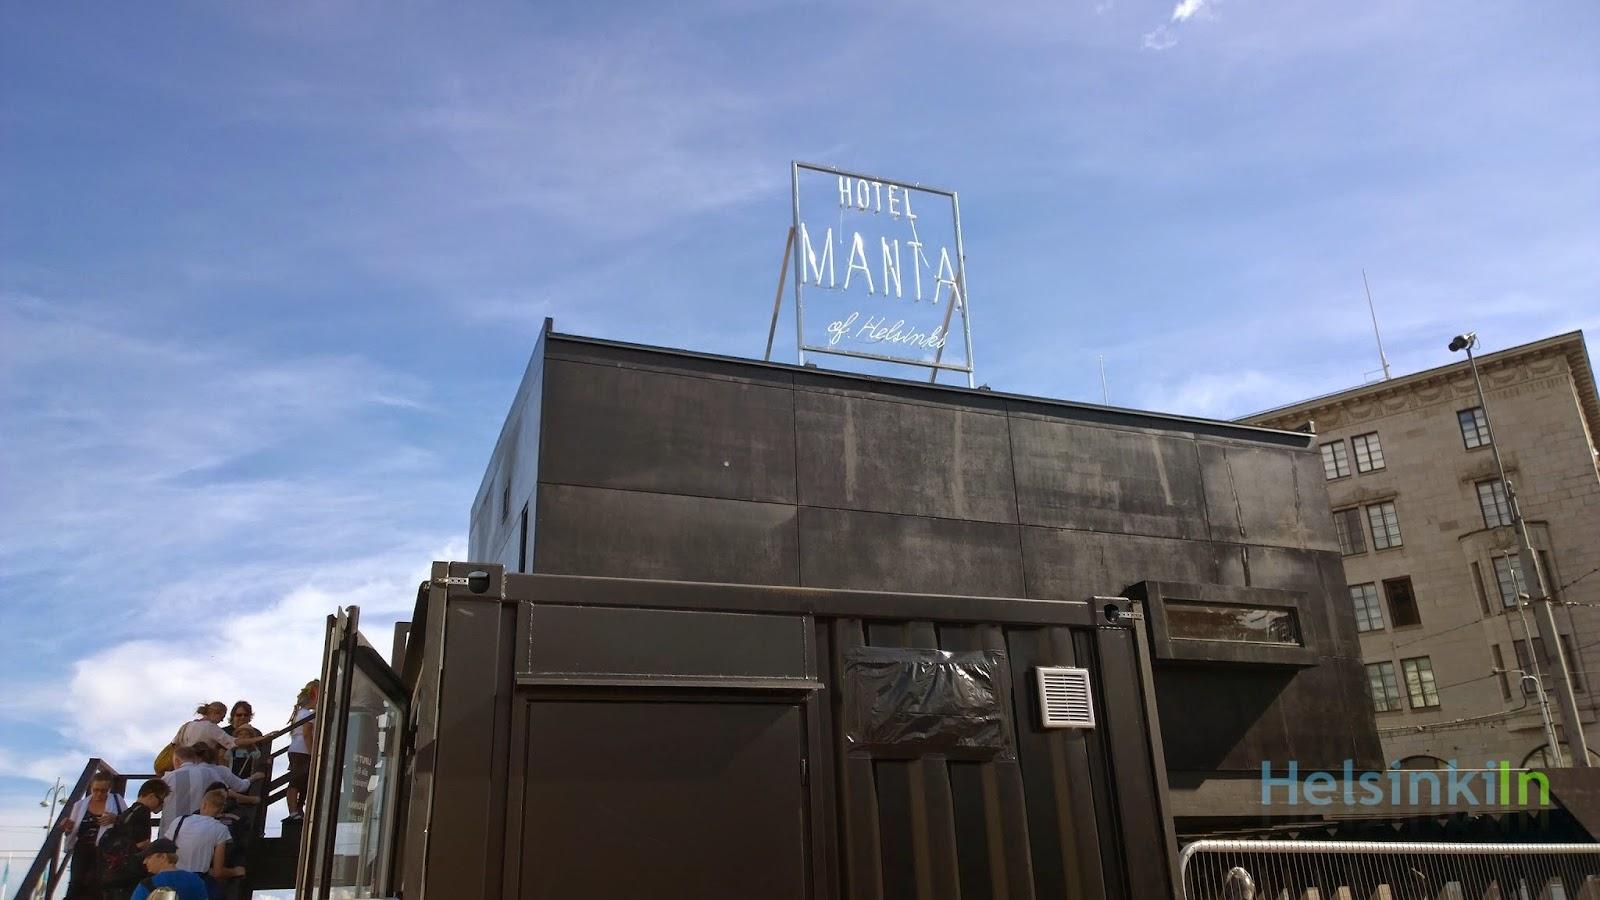 Hotel Manta in Helsinki